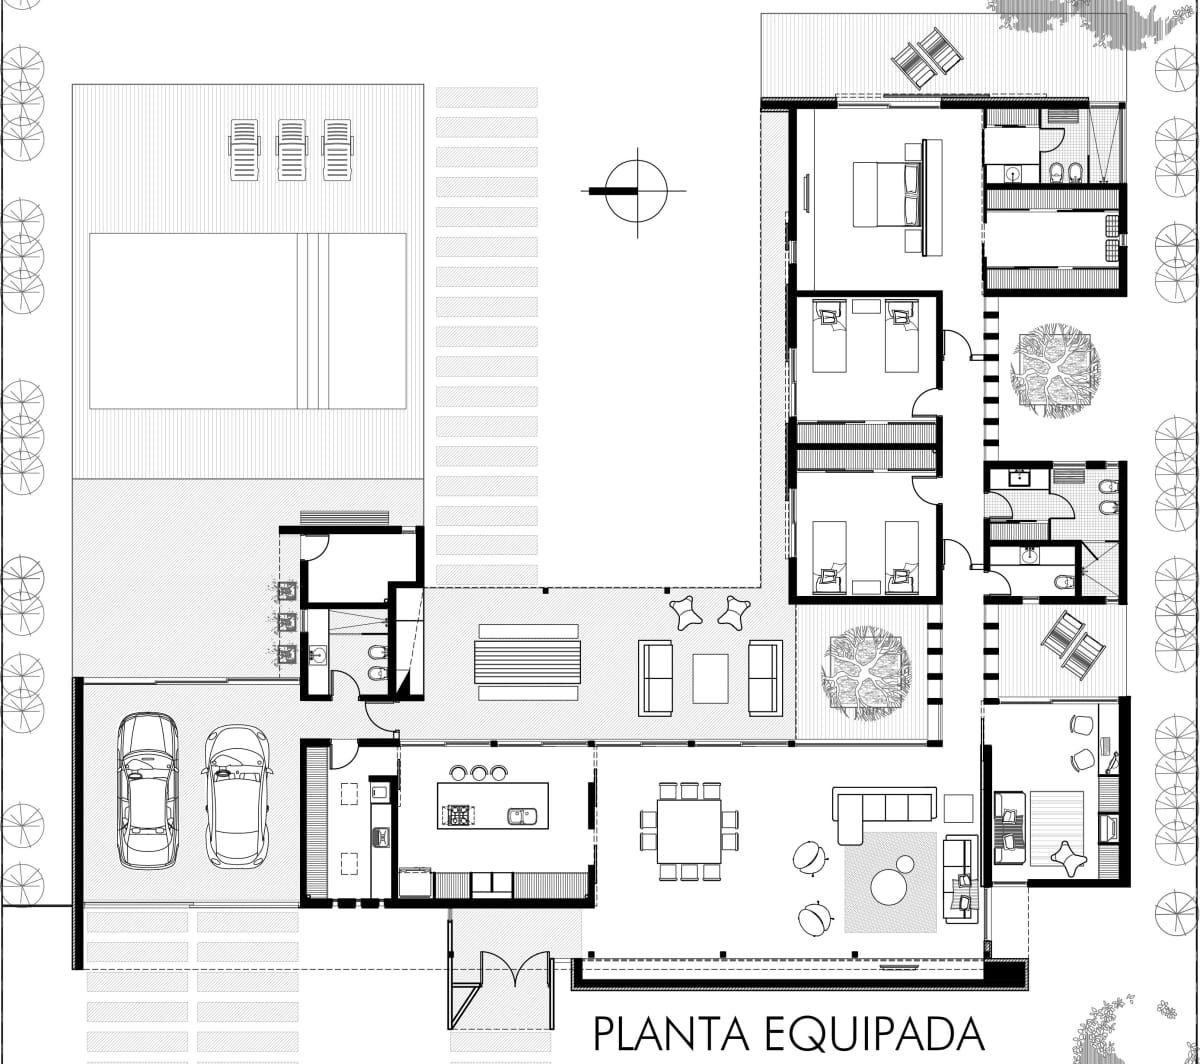 roberto benito, gonzalo viramonte · horizontal house ... horizontal wiring home plan